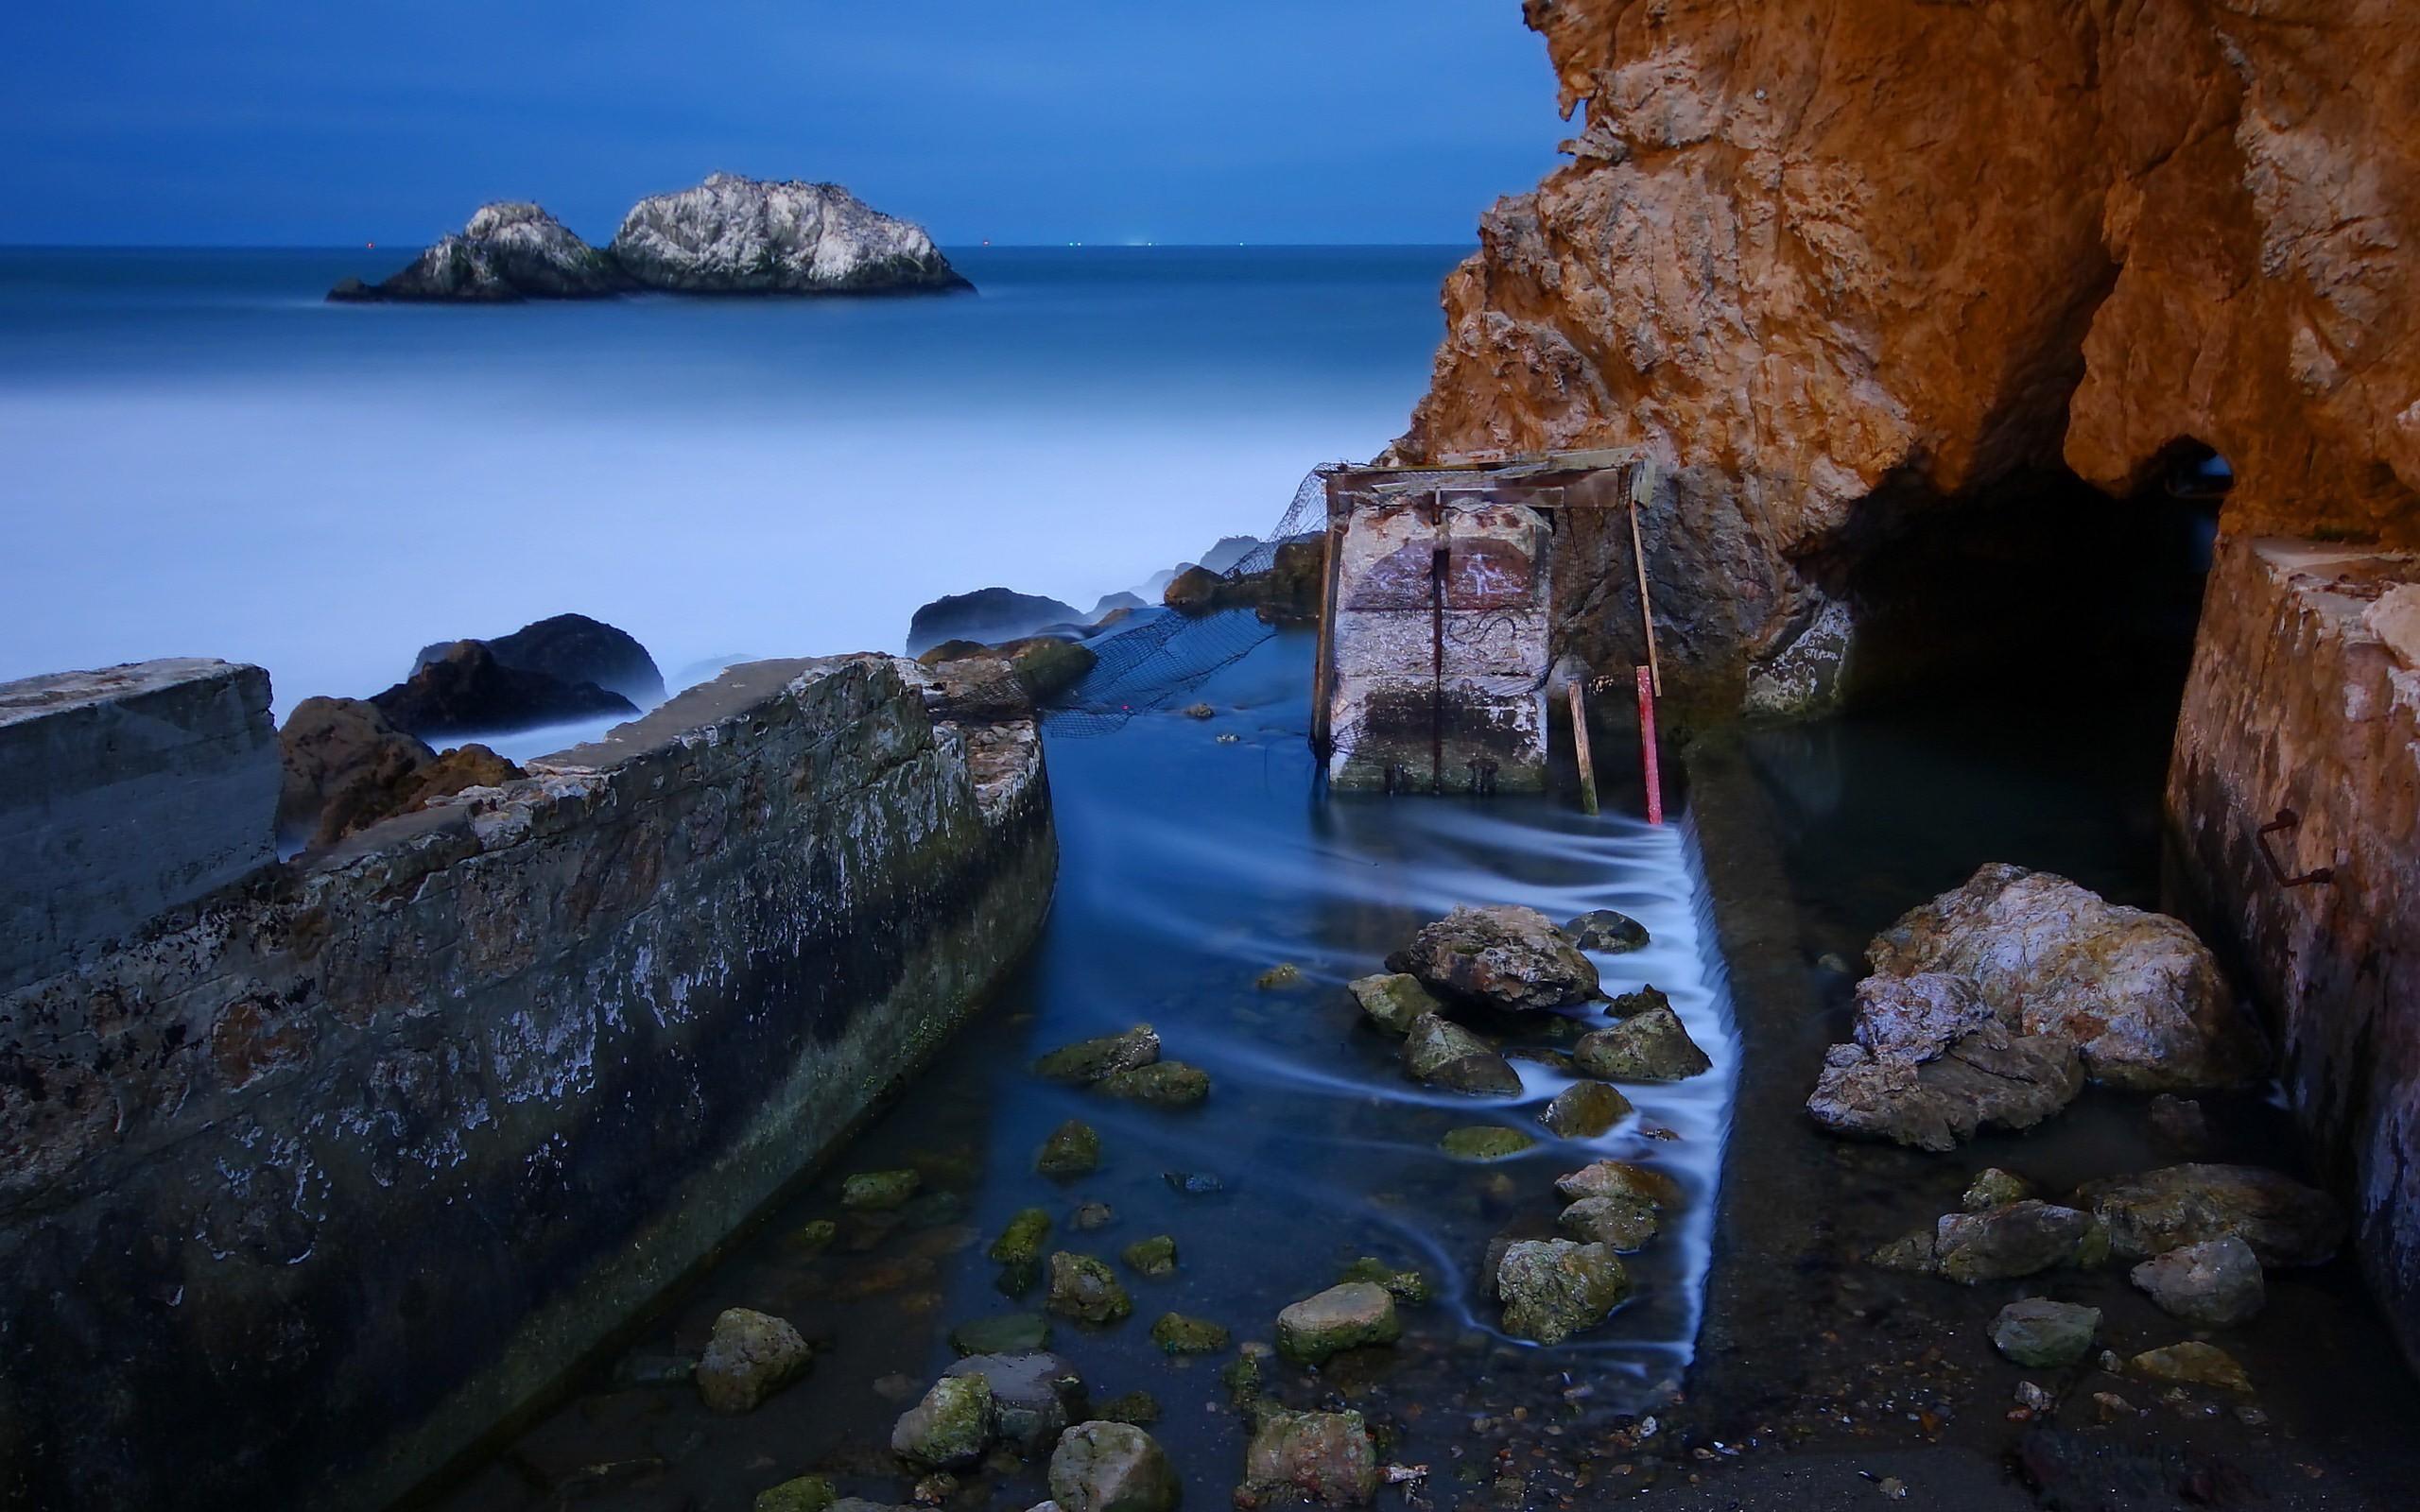 Камень море берег  № 1356402 загрузить